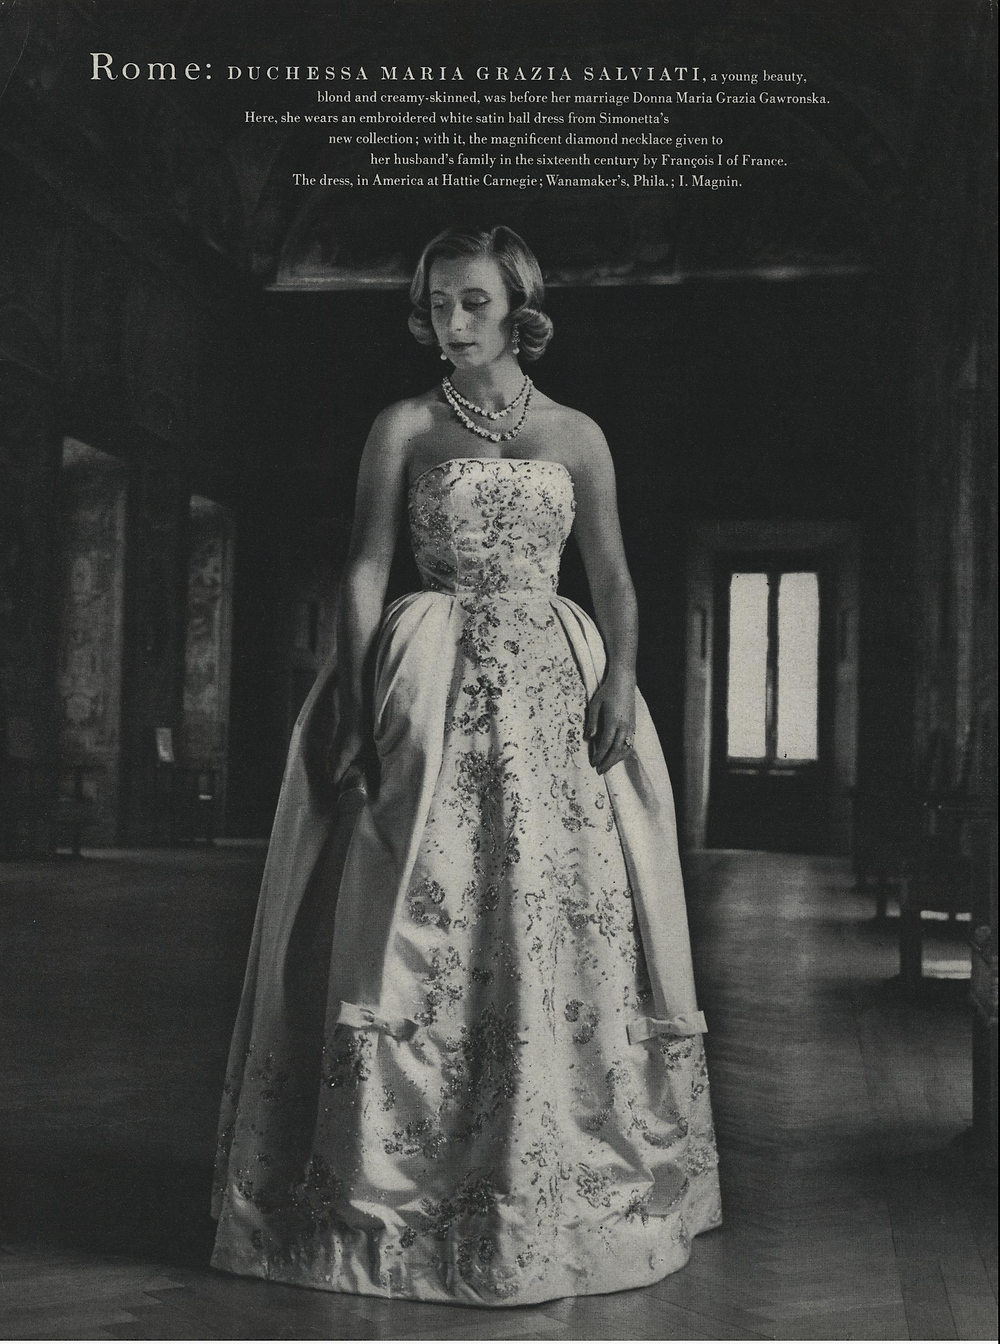 Duchessa Maria Grazia Salviati wearing Simonetta, Vogue, Nov. 1. 1957